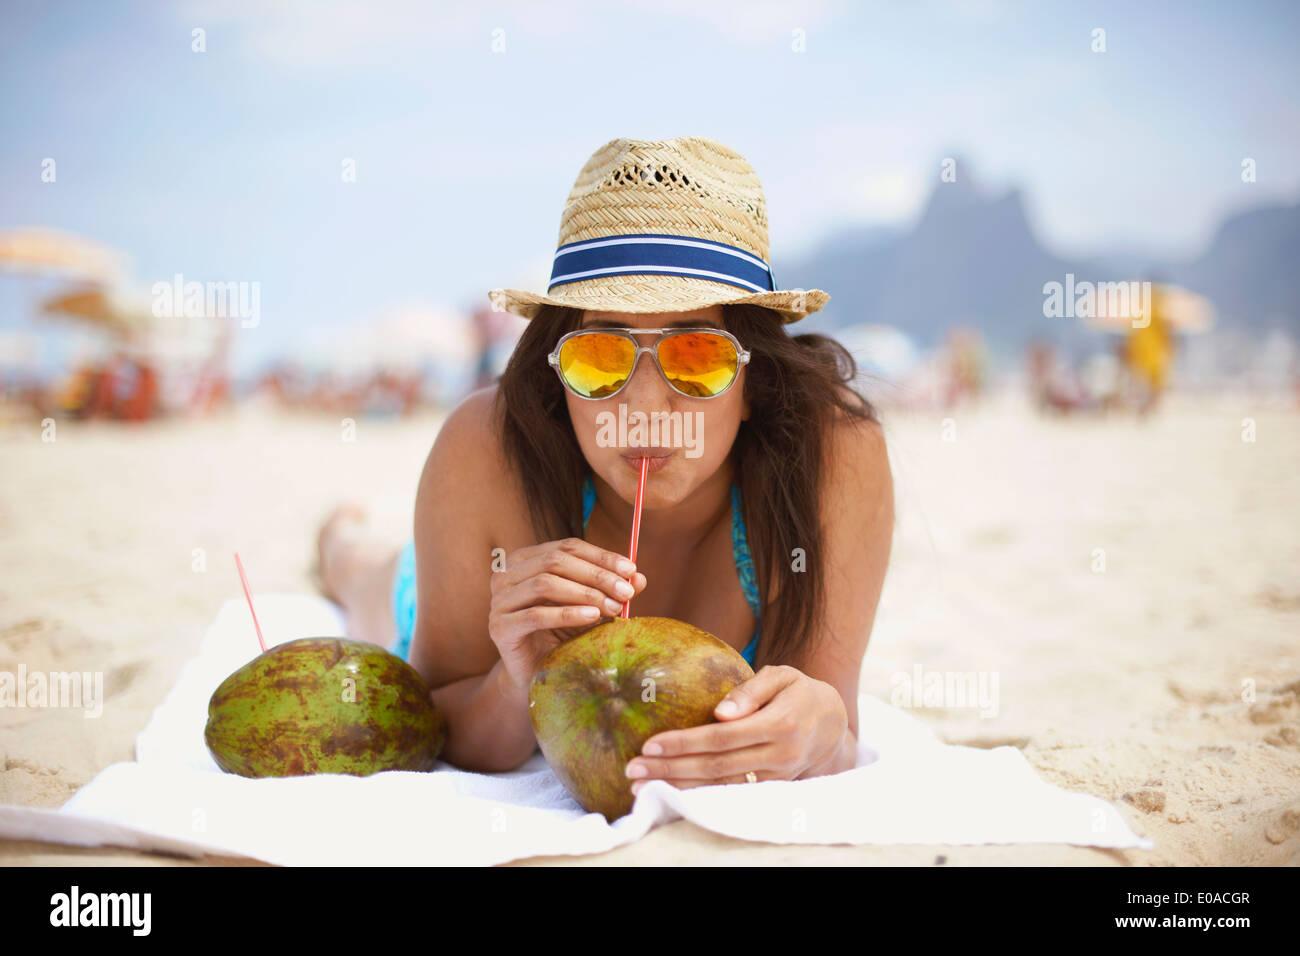 Portrait of mature woman drinking from coconut, Ipanema beach, Rio De Janeiro, Brazil - Stock Image